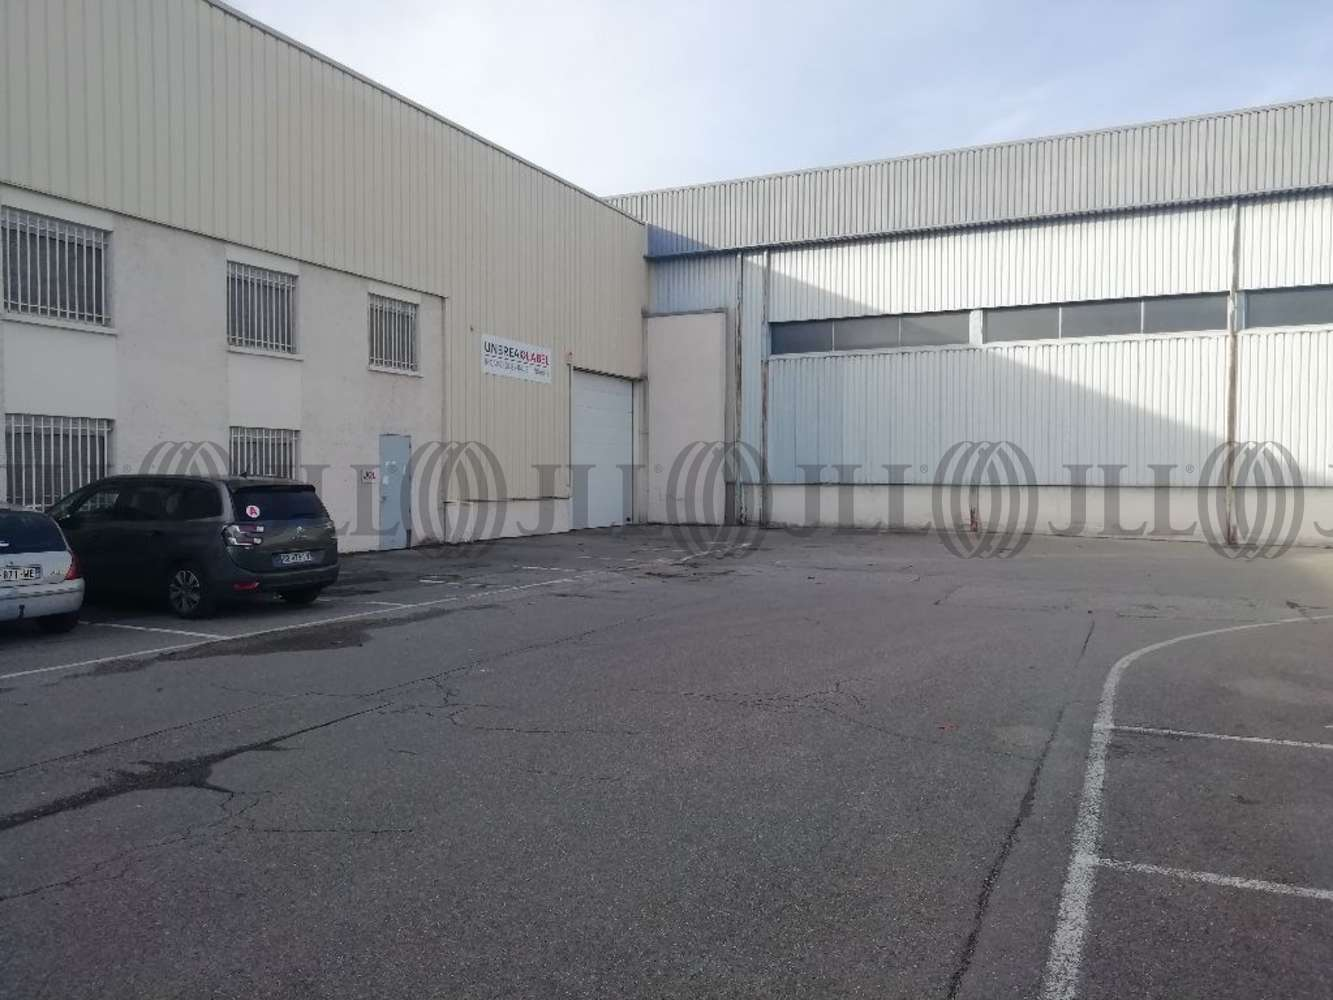 Activités/entrepôt Villeurbanne, 69100 - Location entrepot Villeurbanne (Lyon) - 9861552